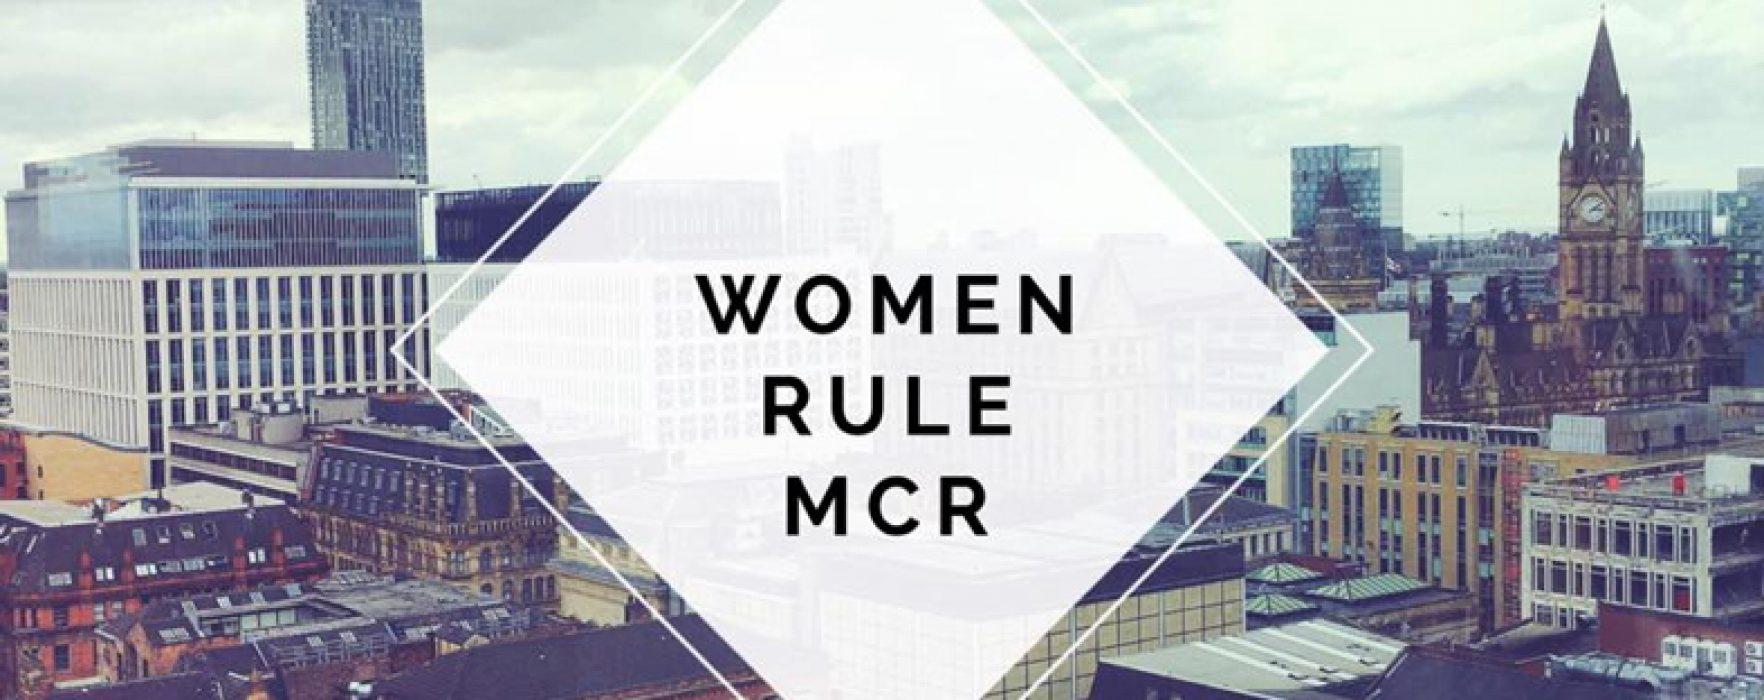 Manchester Celebrates 100 Years of Radical Women